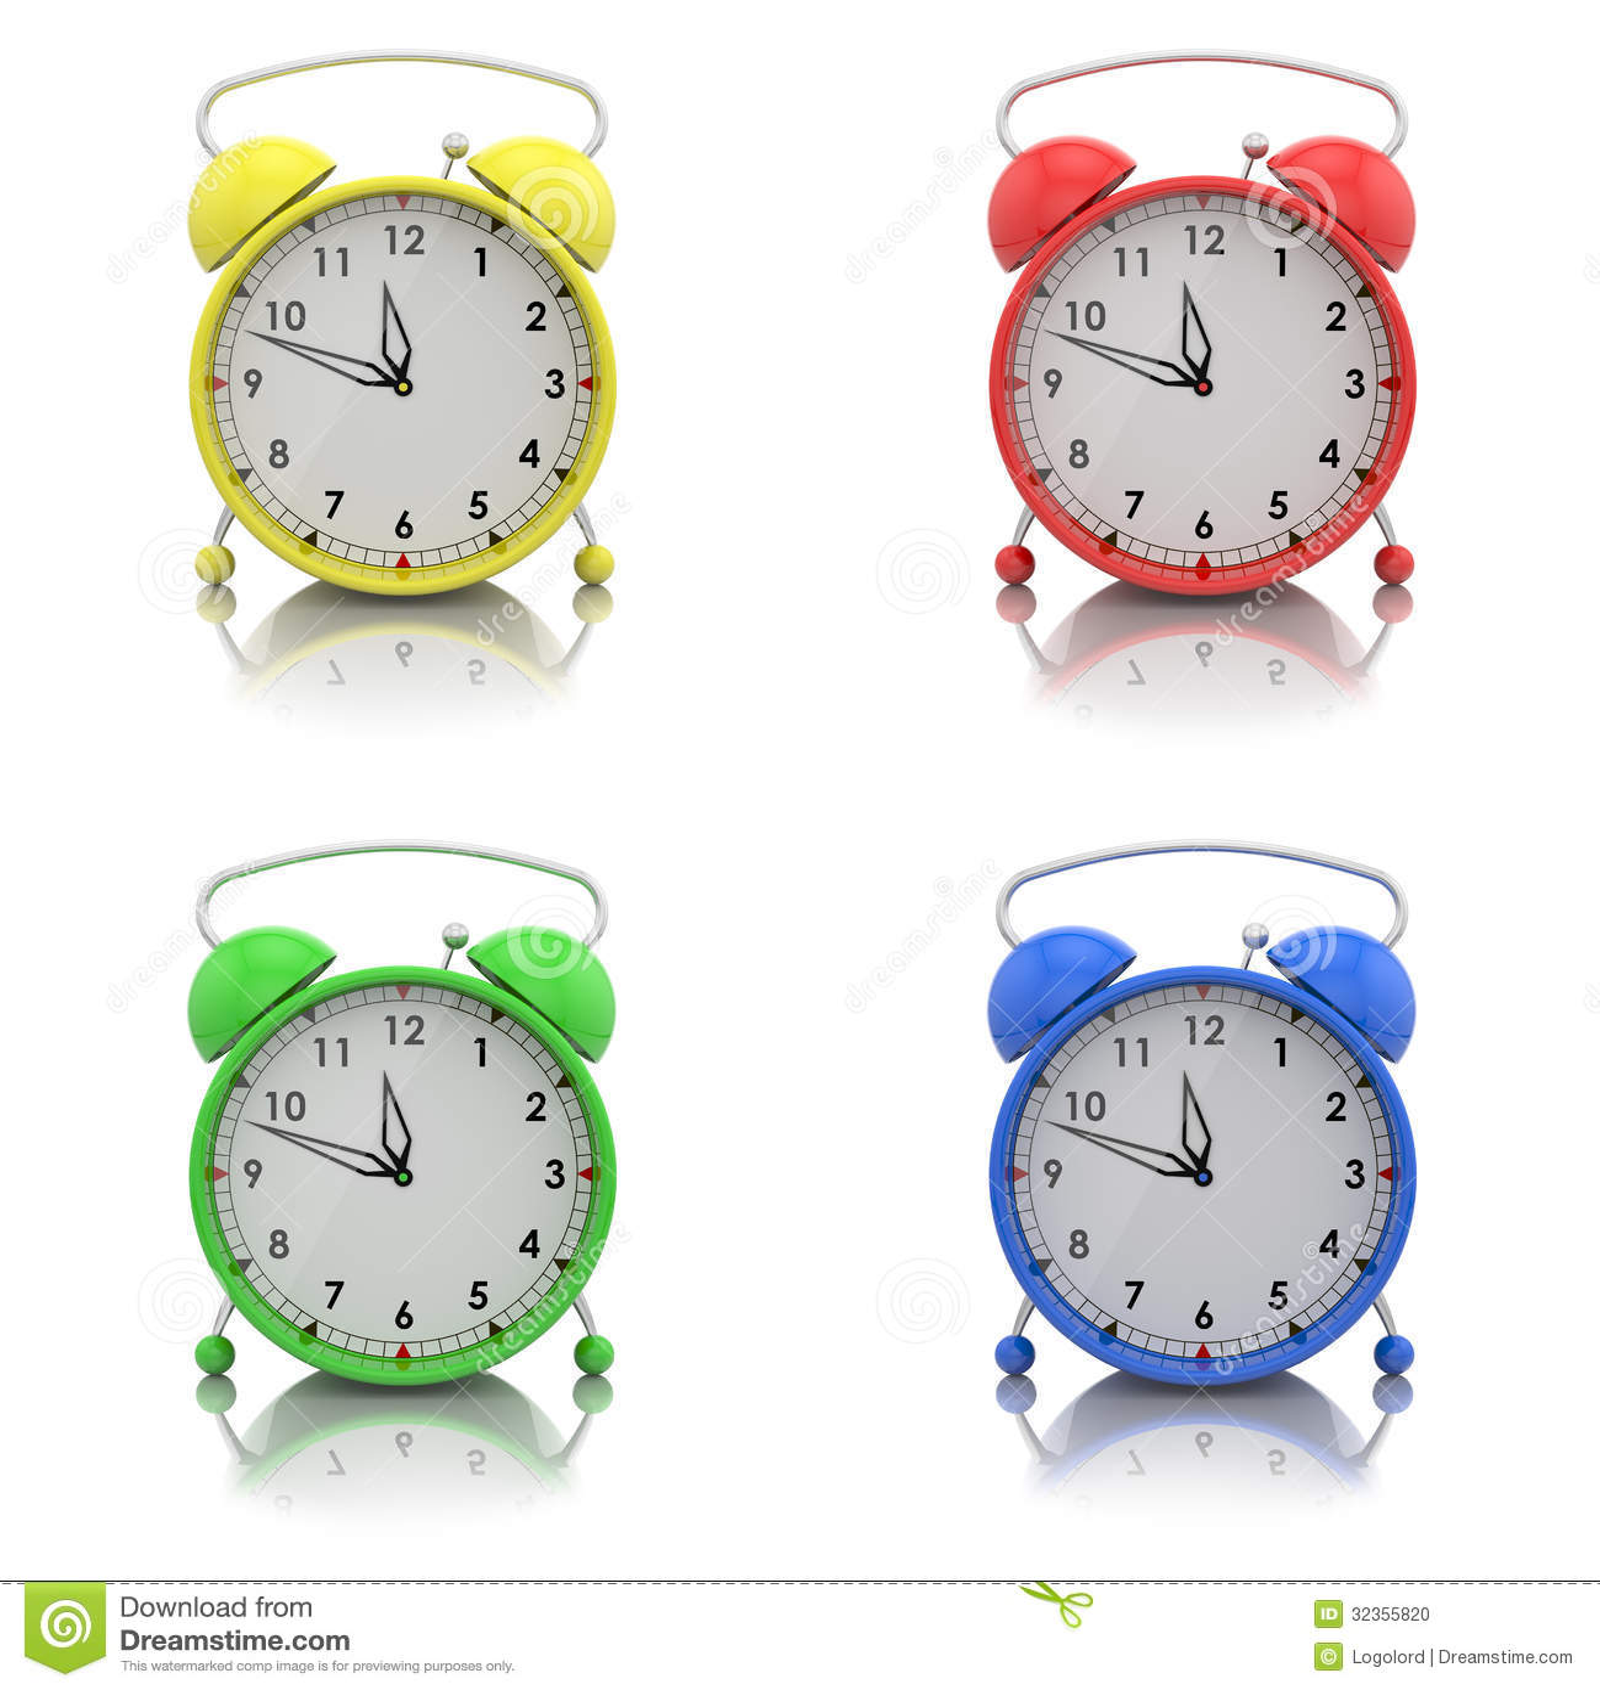 how to set alarm on hosunda clock